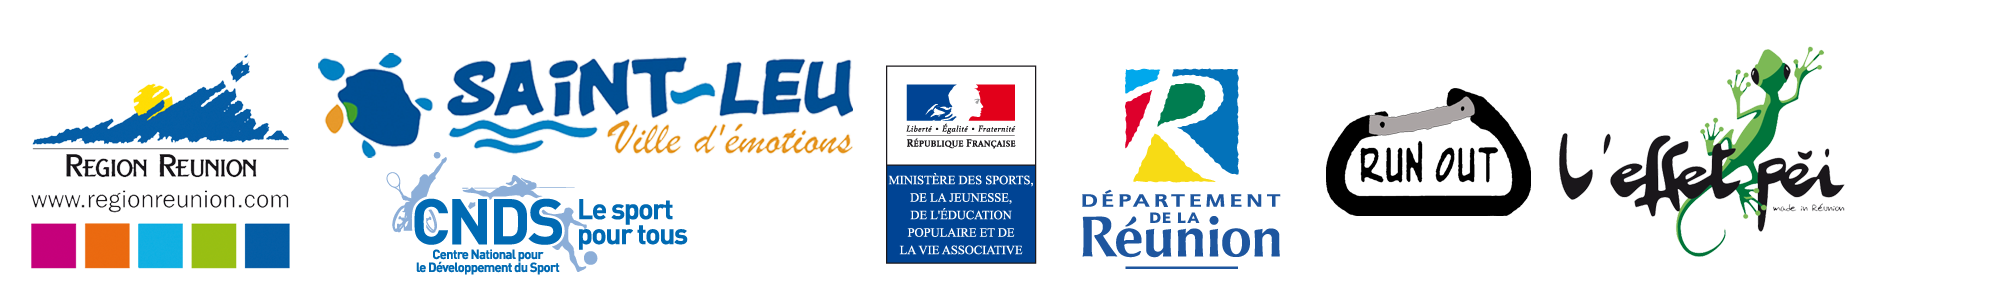 CDF-2014-baniere-sponsors